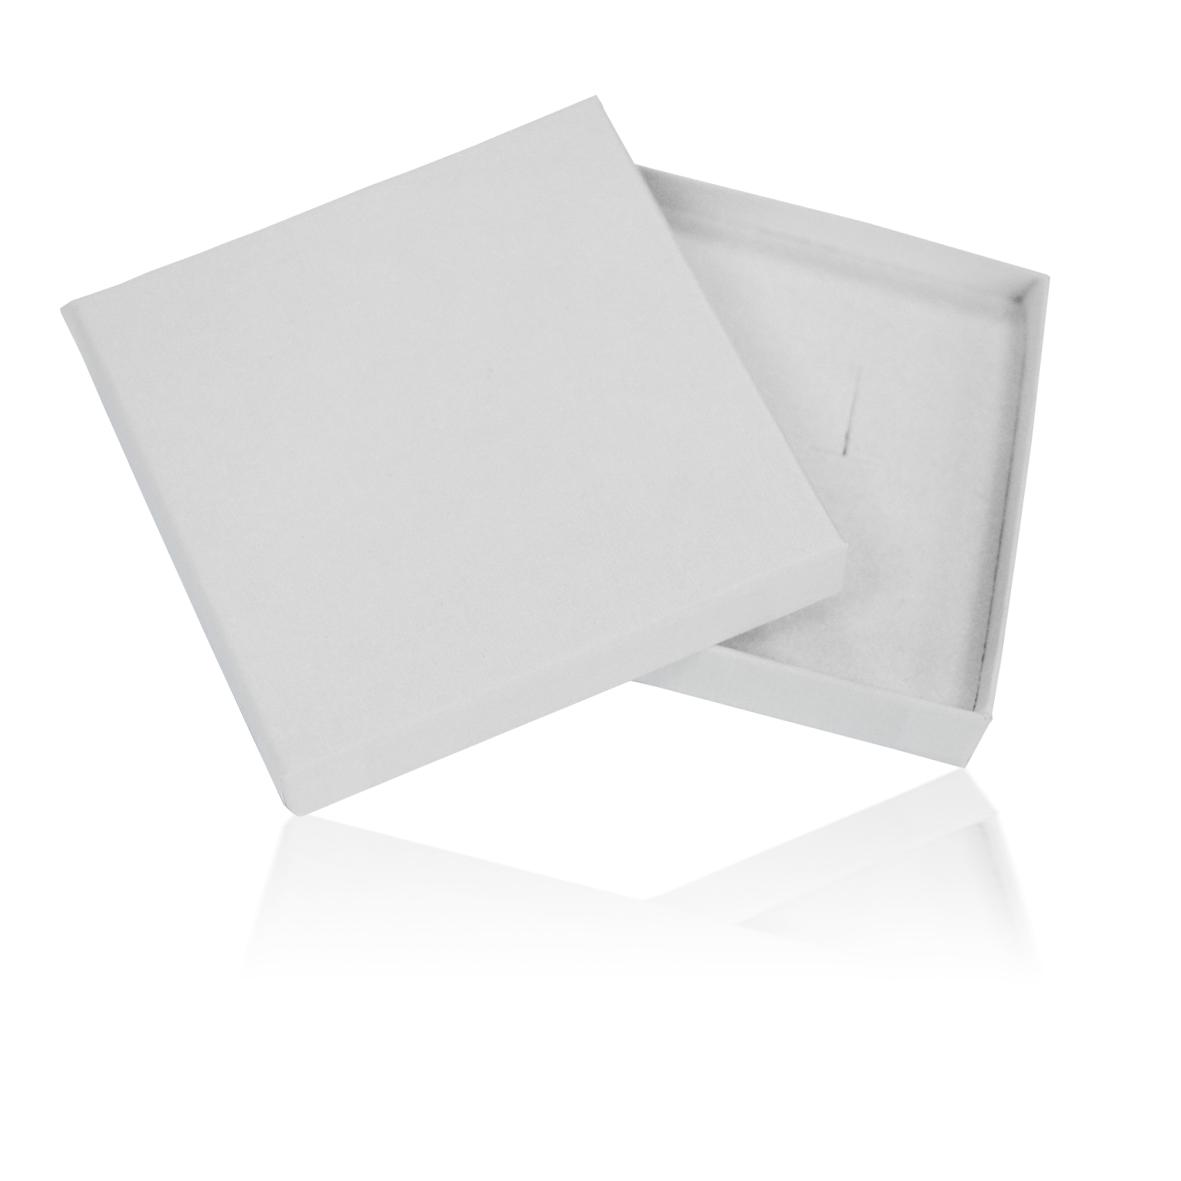 mini boite ultra plate blanche carton rigide avec mousse int gr e bbwp86. Black Bedroom Furniture Sets. Home Design Ideas